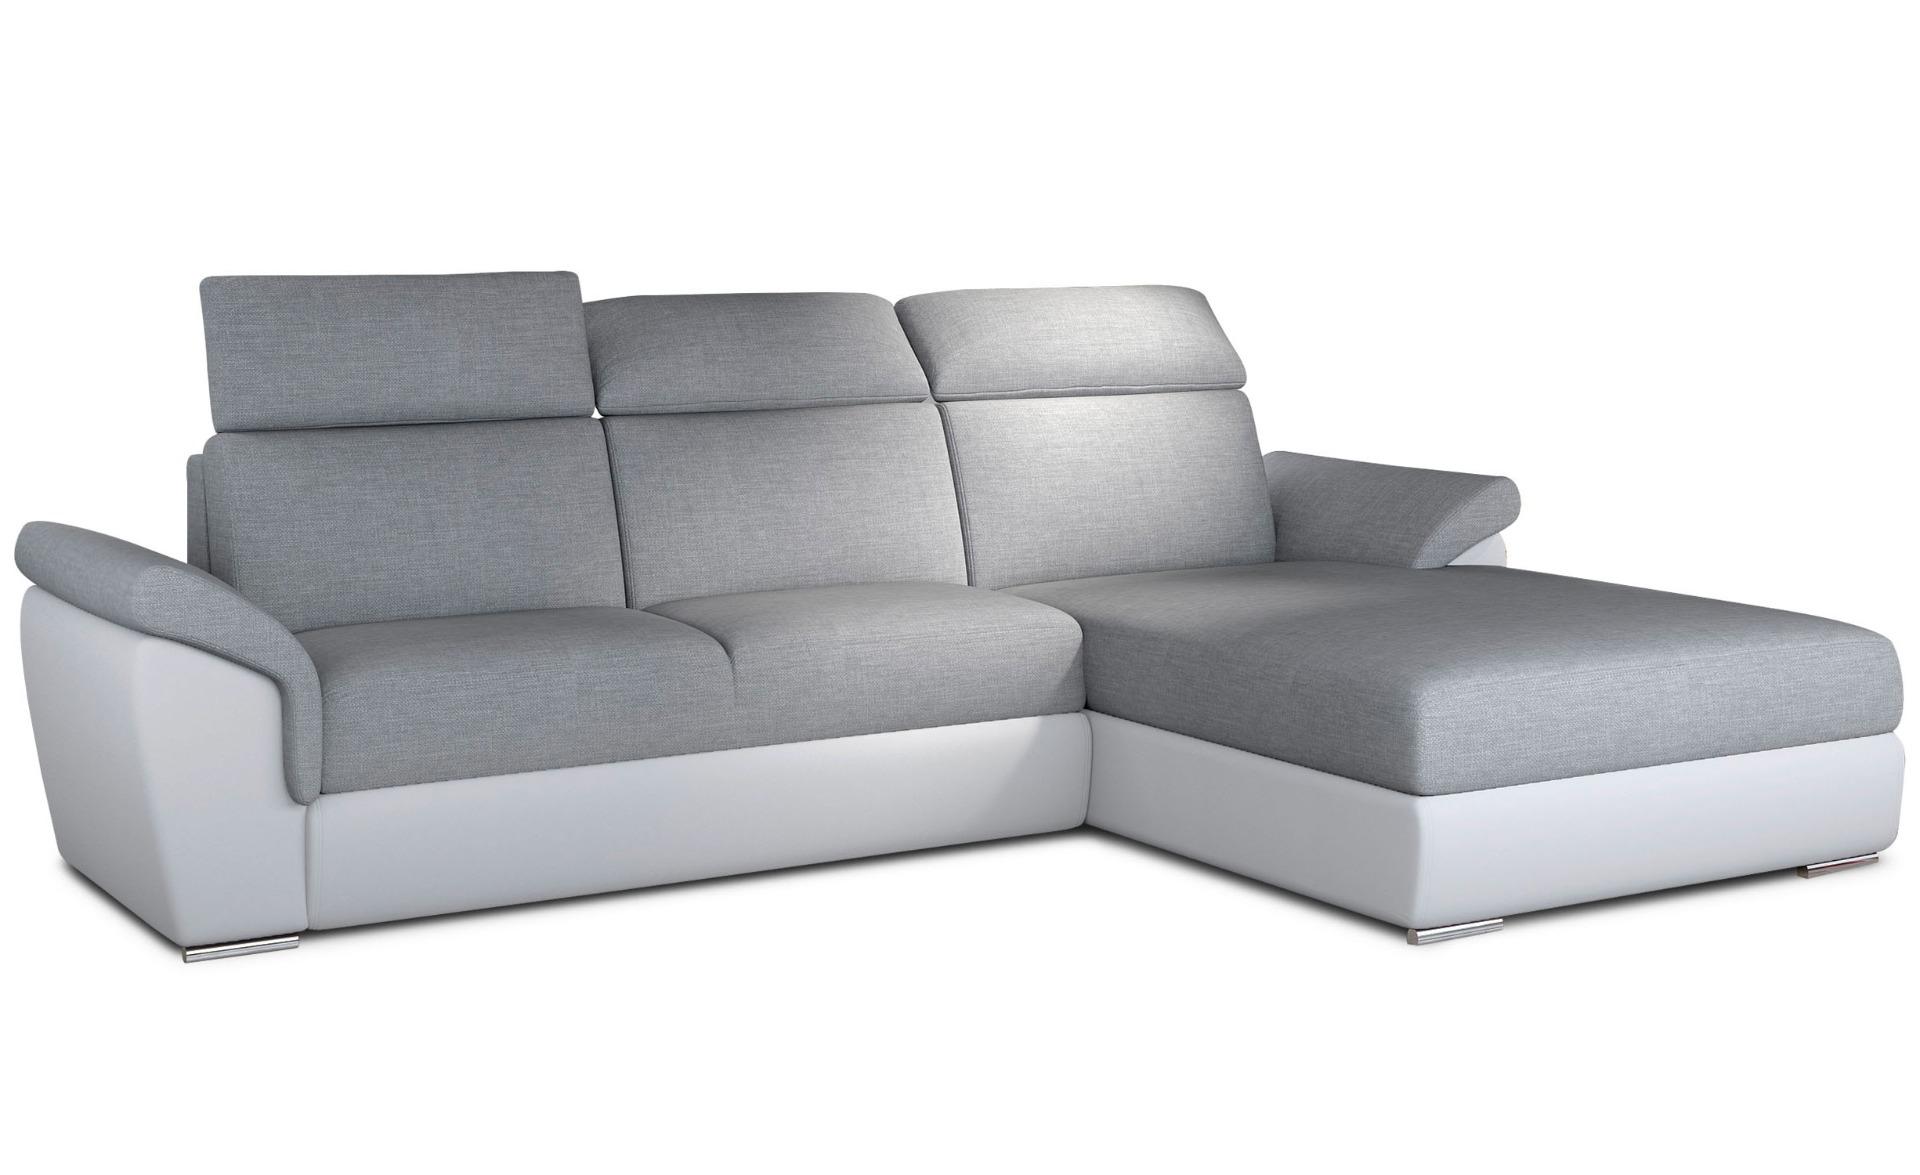 Canapé d'angle convertible Trevisco Tissu Gris et Simili Blanc